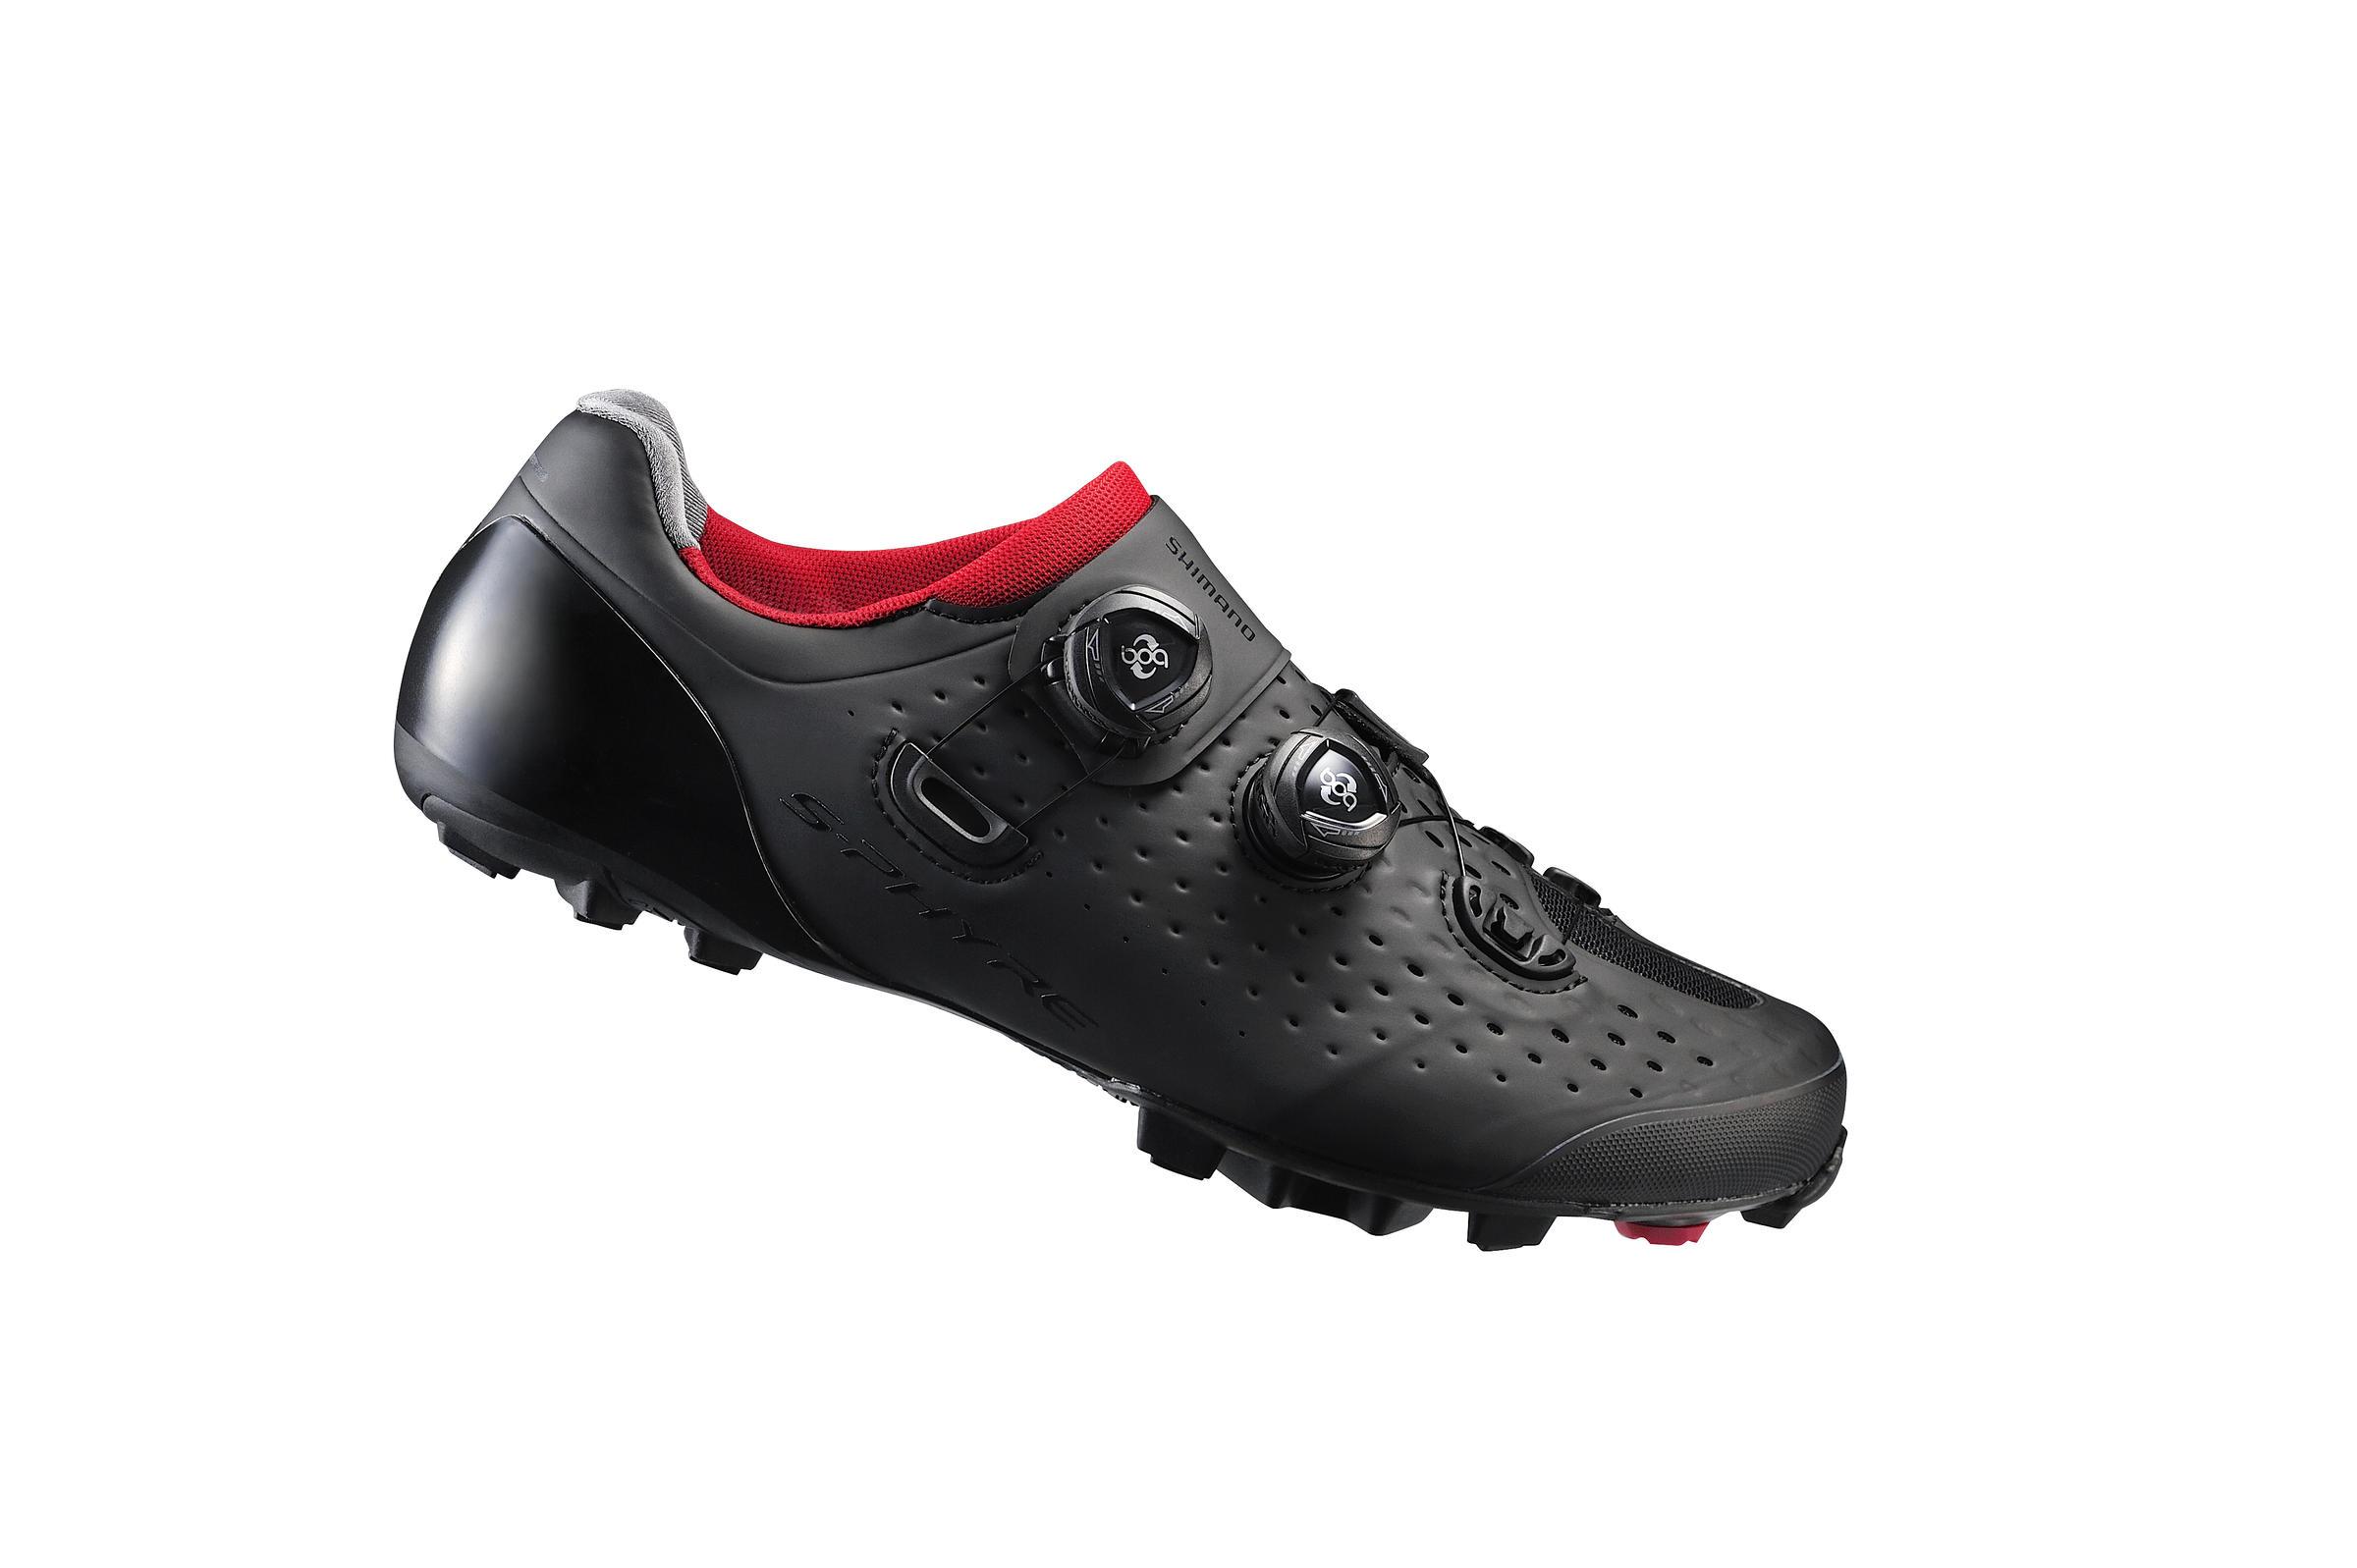 81c31b4b498 Shimano S-Phyre XC9 Shoes - Bateman's Bicycle Company - Toronto, ON